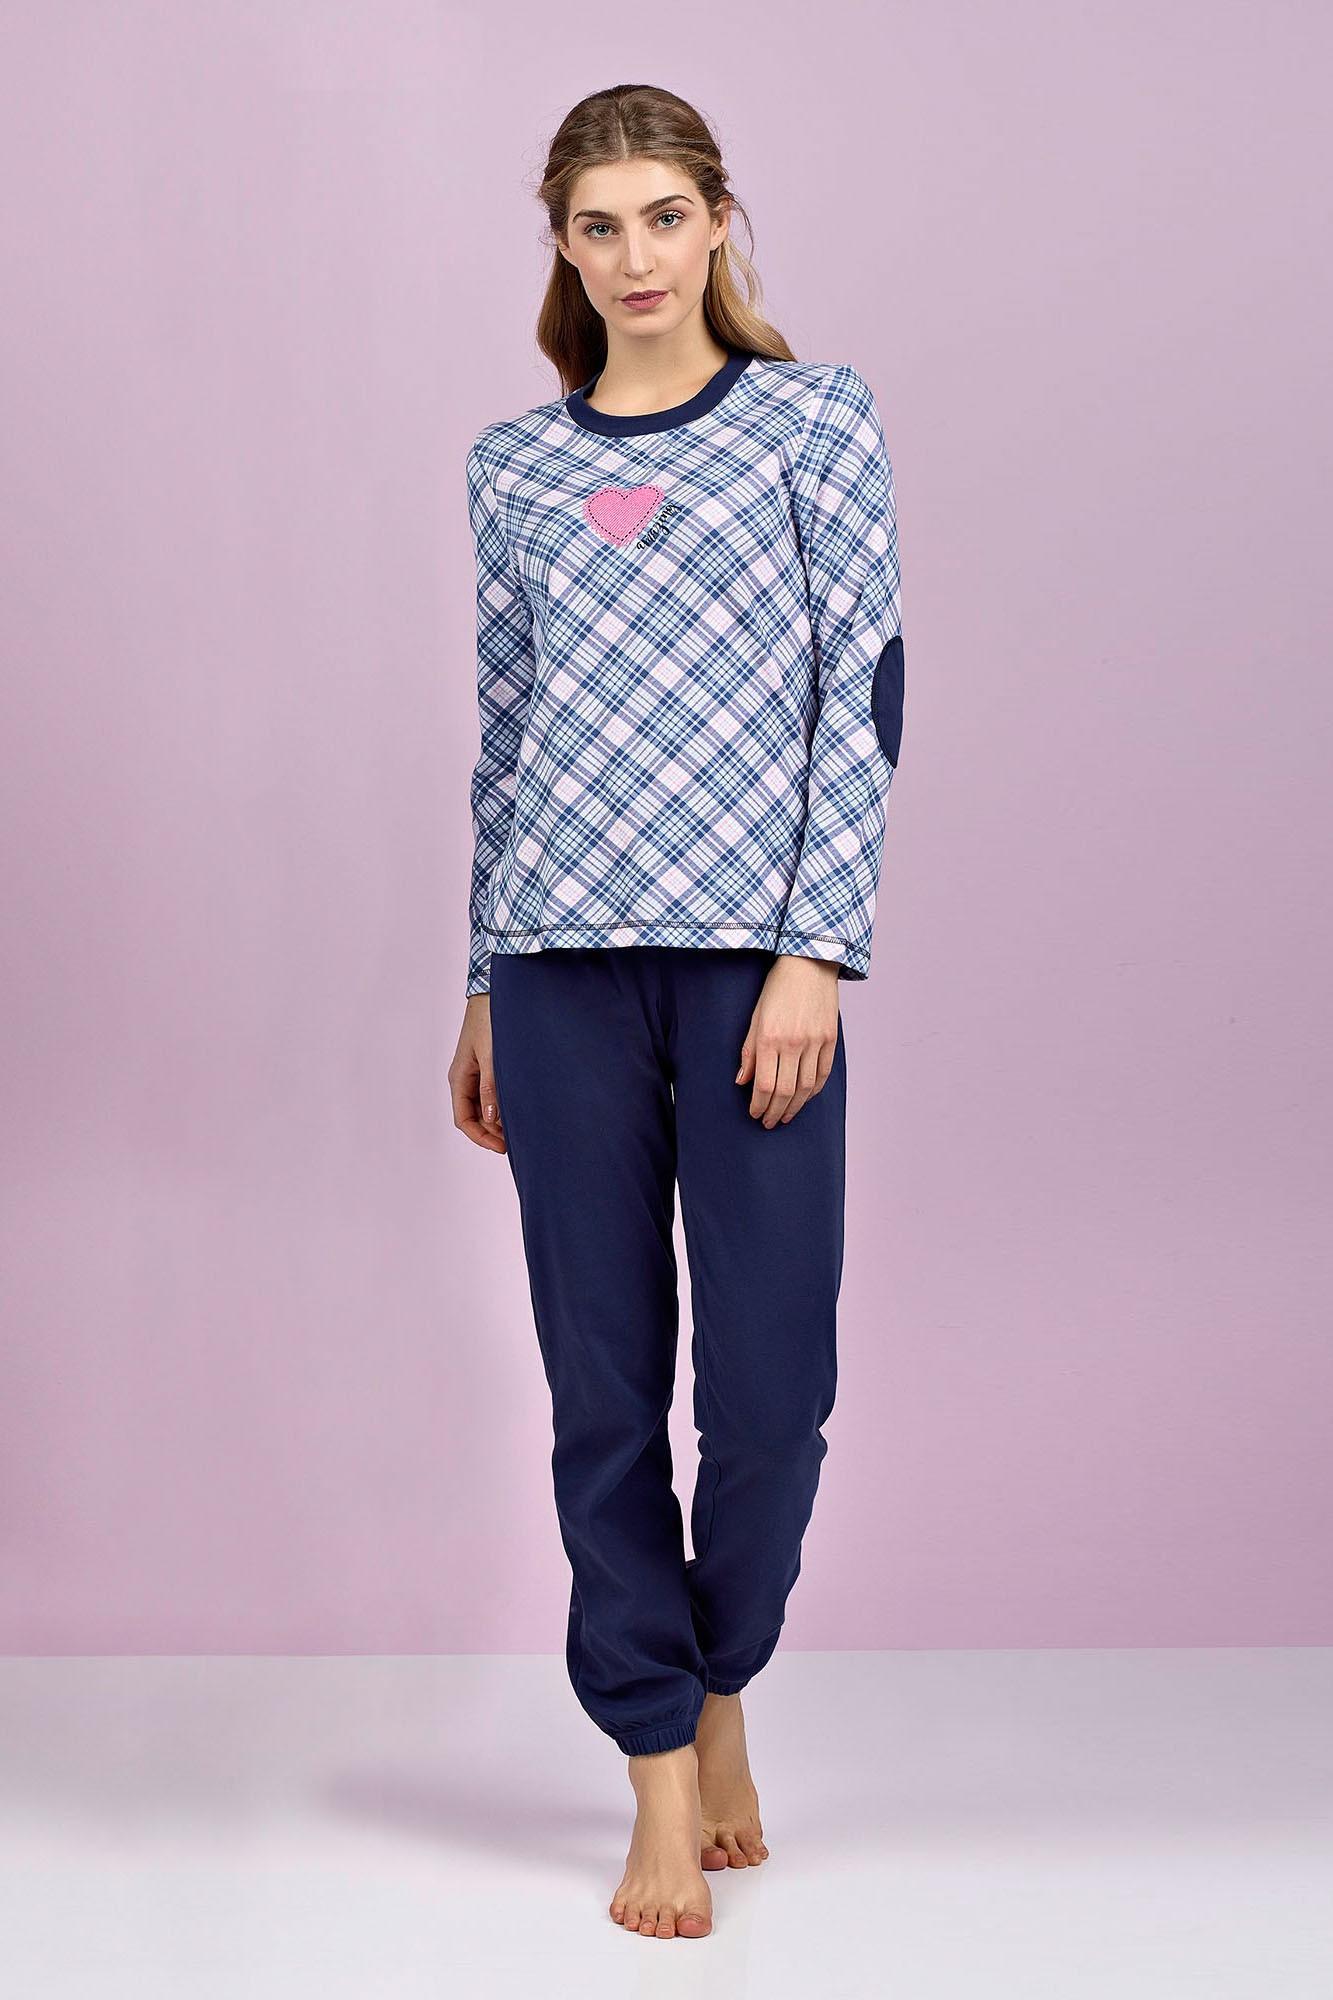 Dámské pyžamo 4955 - Vamp Barva: originál, Velikost: S